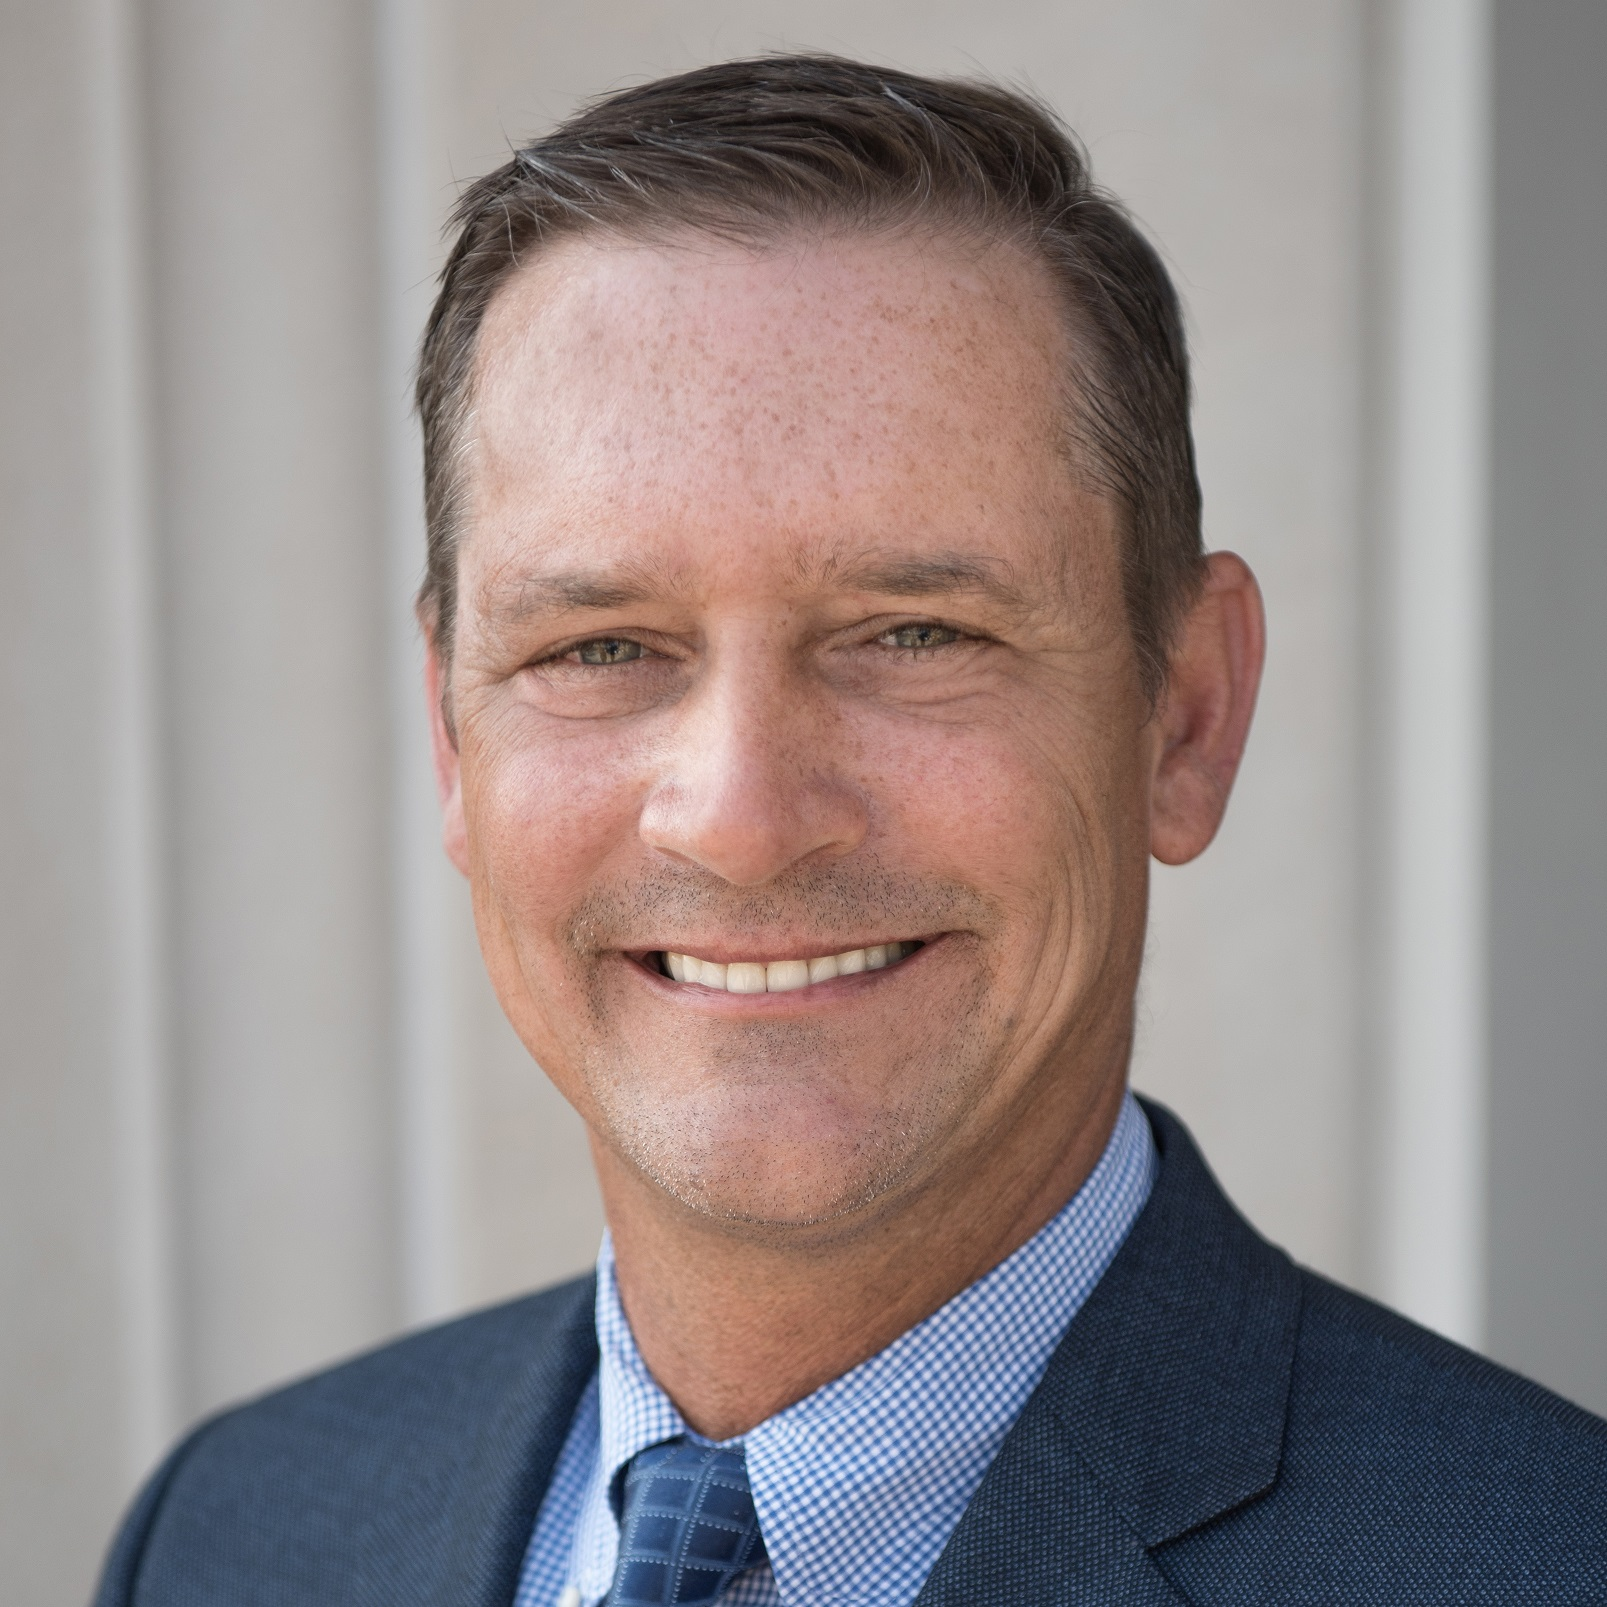 Jeff H. Brimm